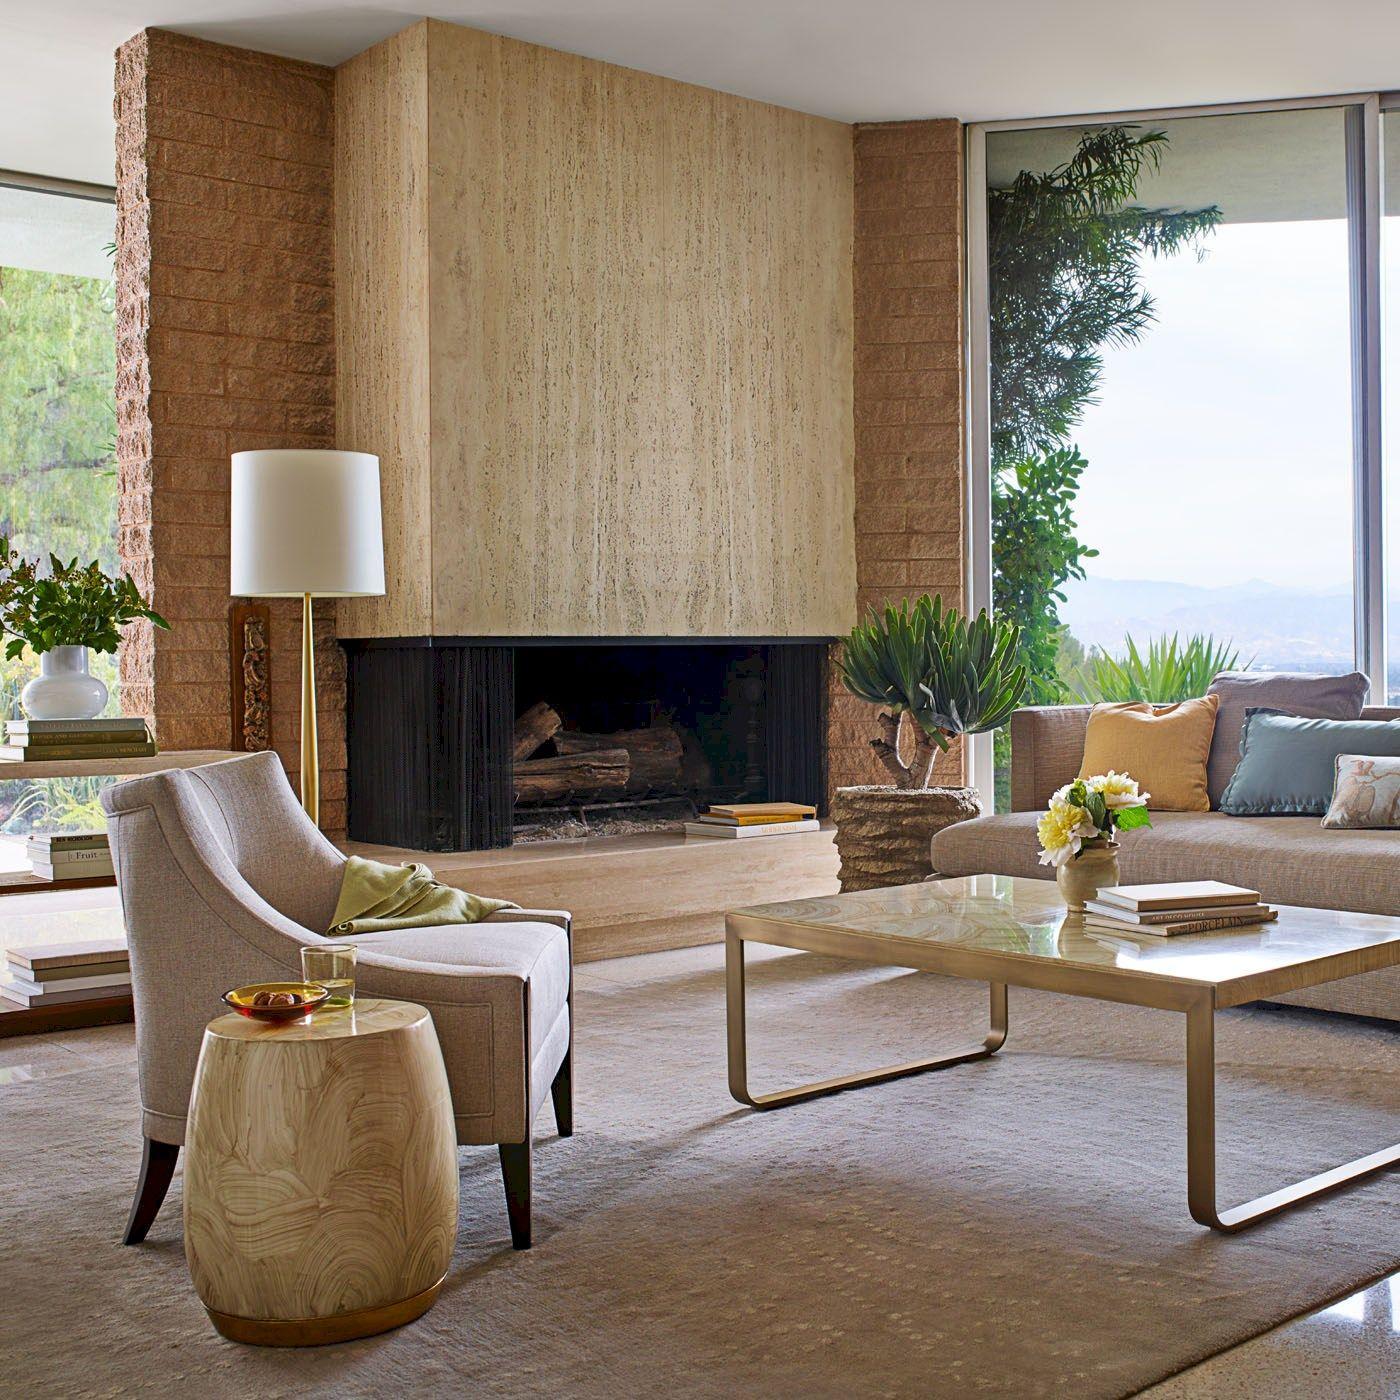 barbara barry furniture. Barbara Barry / Baker Furniture Tufenkian Carpets - Tiara Parchment: Https://www.tufenkianoutlet.com/p-3384-tiara-parchment.aspx